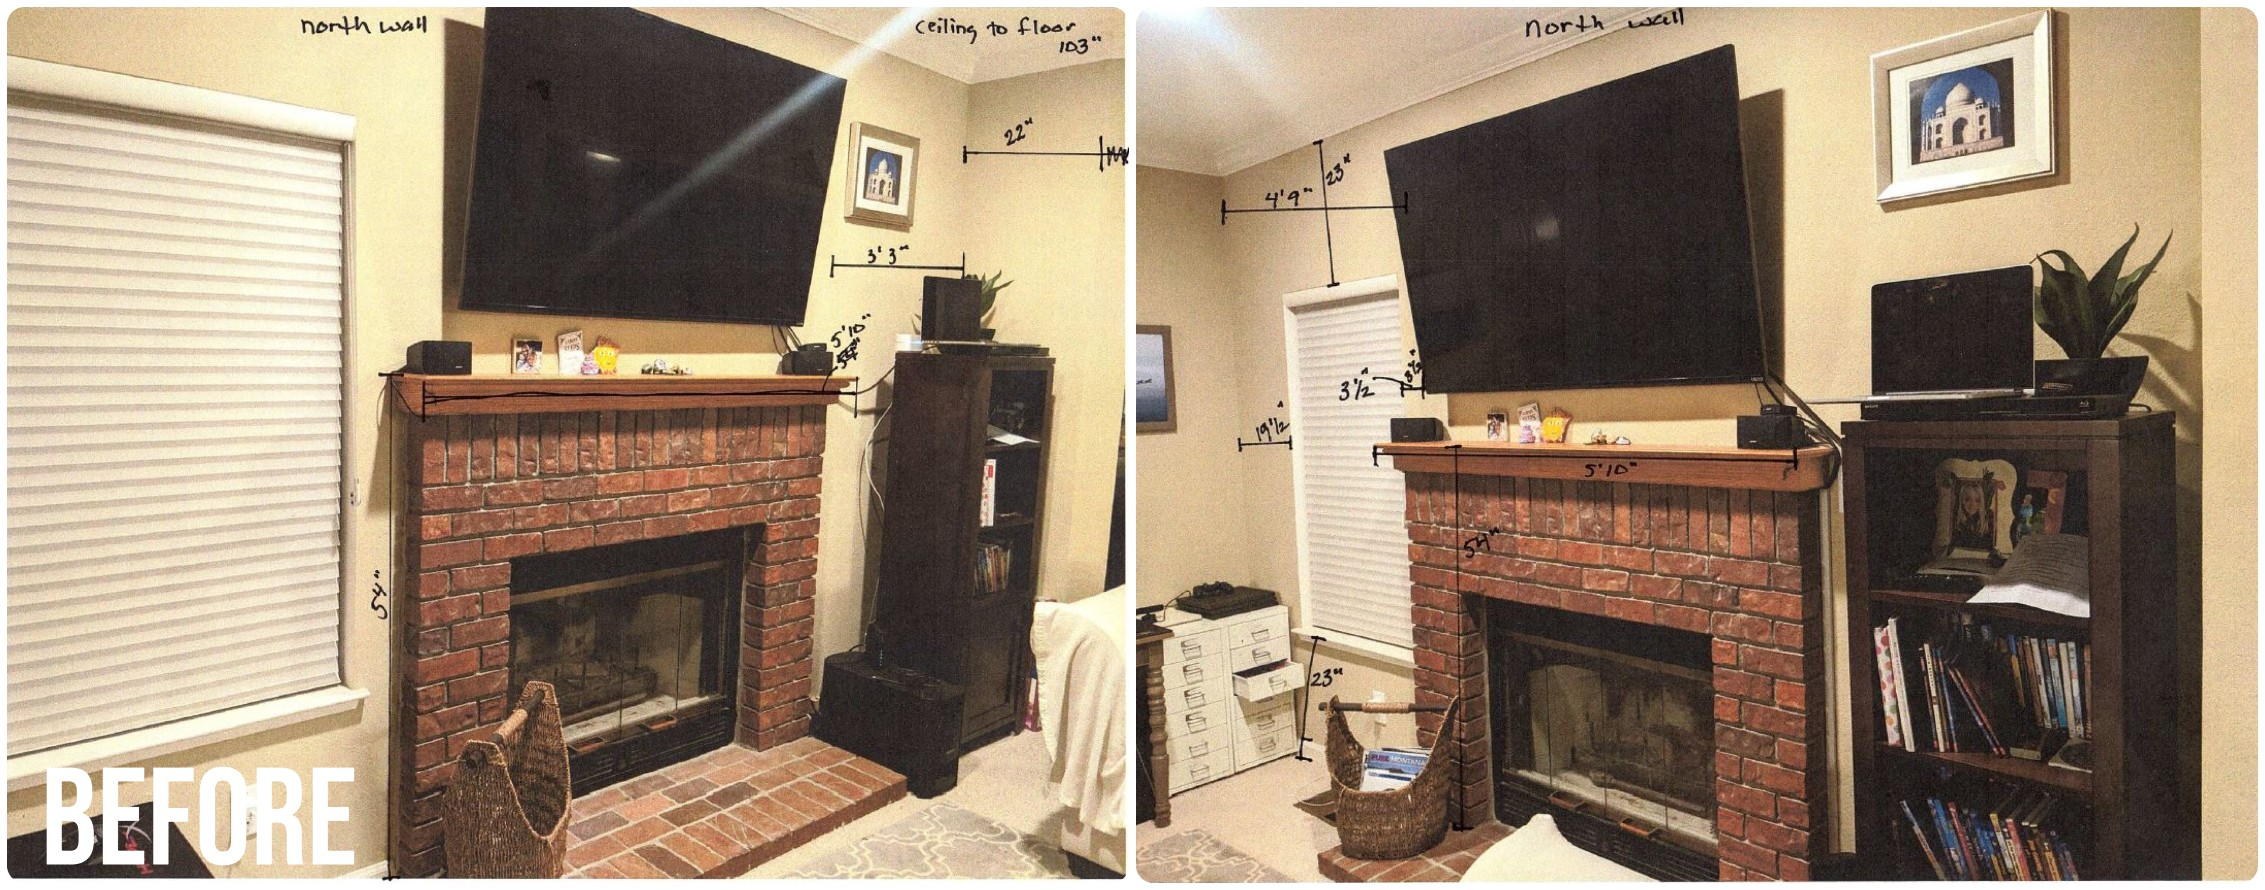 before room pictures online virtual interior e-design